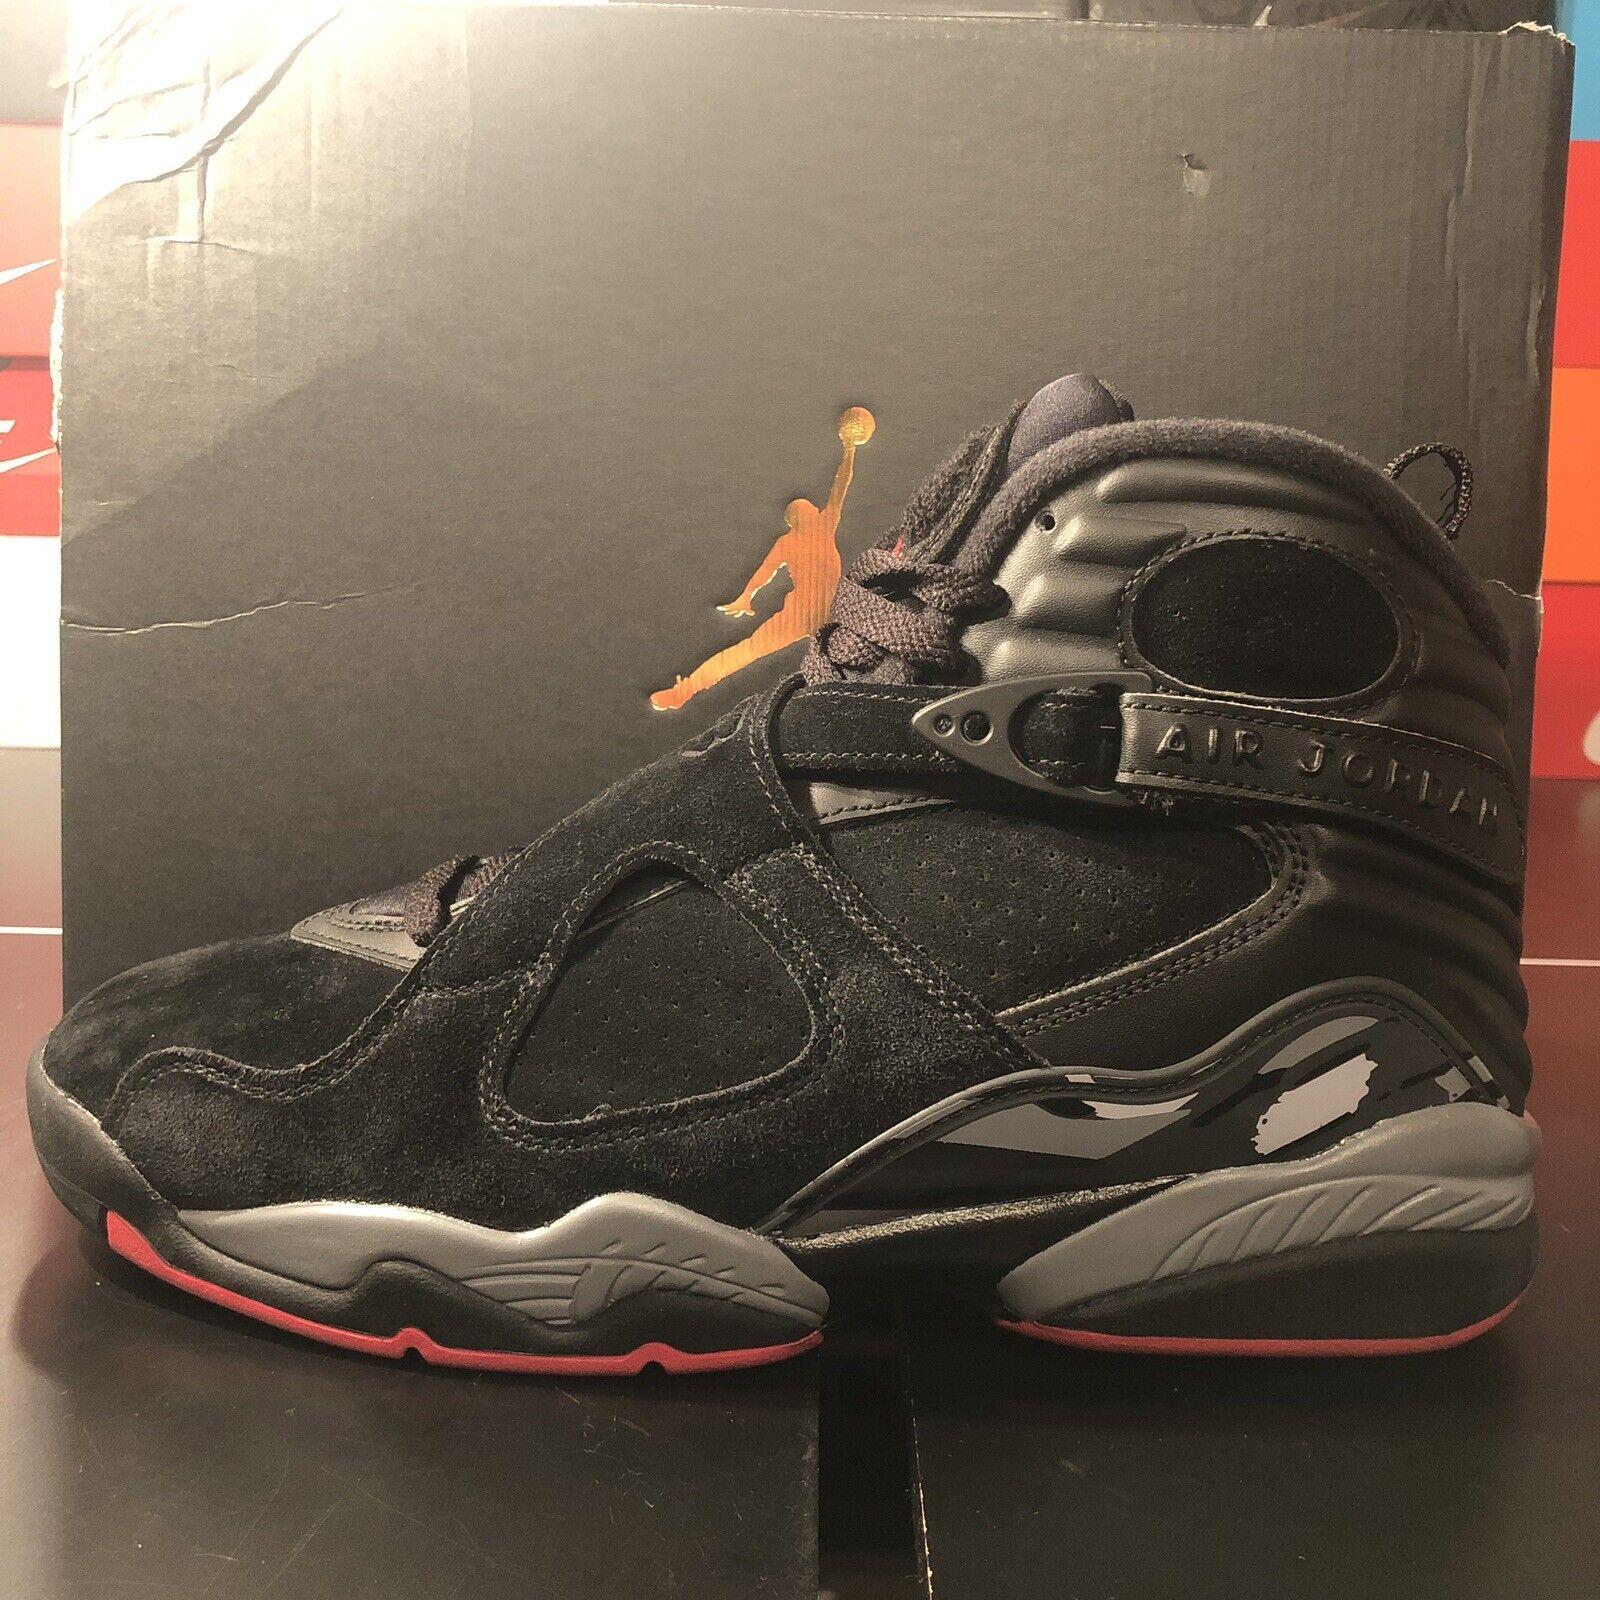 Jordan 8 Retro  Cement Air  negro GYM rojo 305381-022 {} para hombres